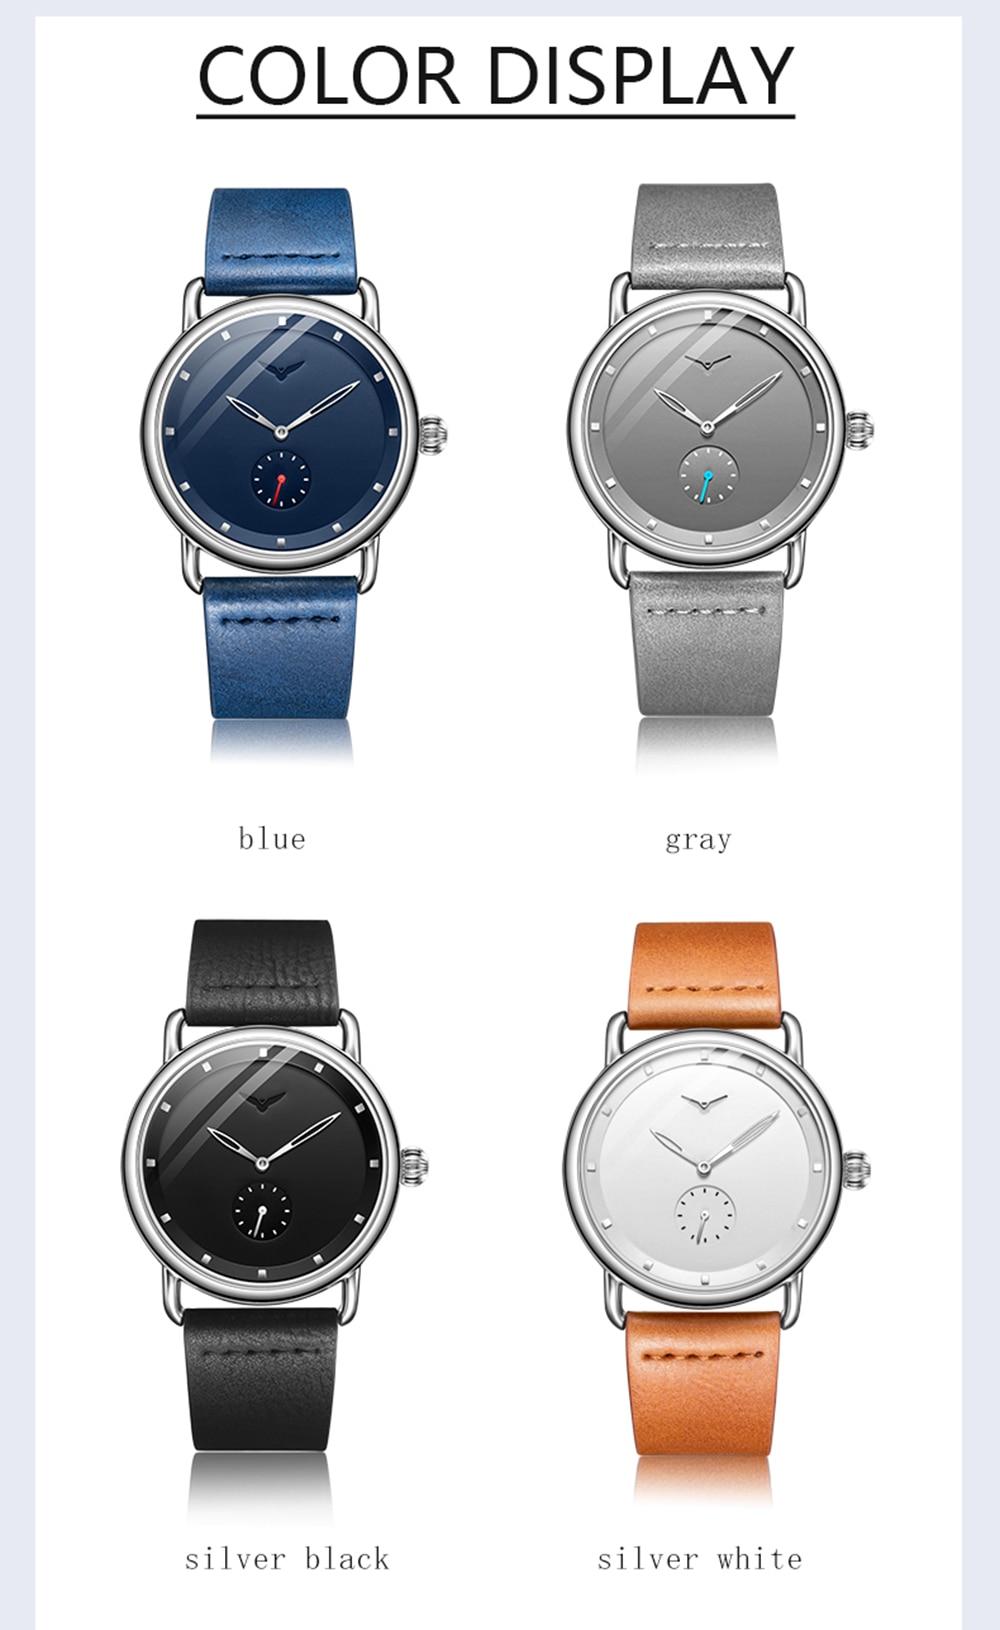 H83b2b1bfa08840f48a98dde5e27e3af91 ONOLA top brand leather men watches clock fashion sport simple casual waterproof Wrist watch men relogio masculino